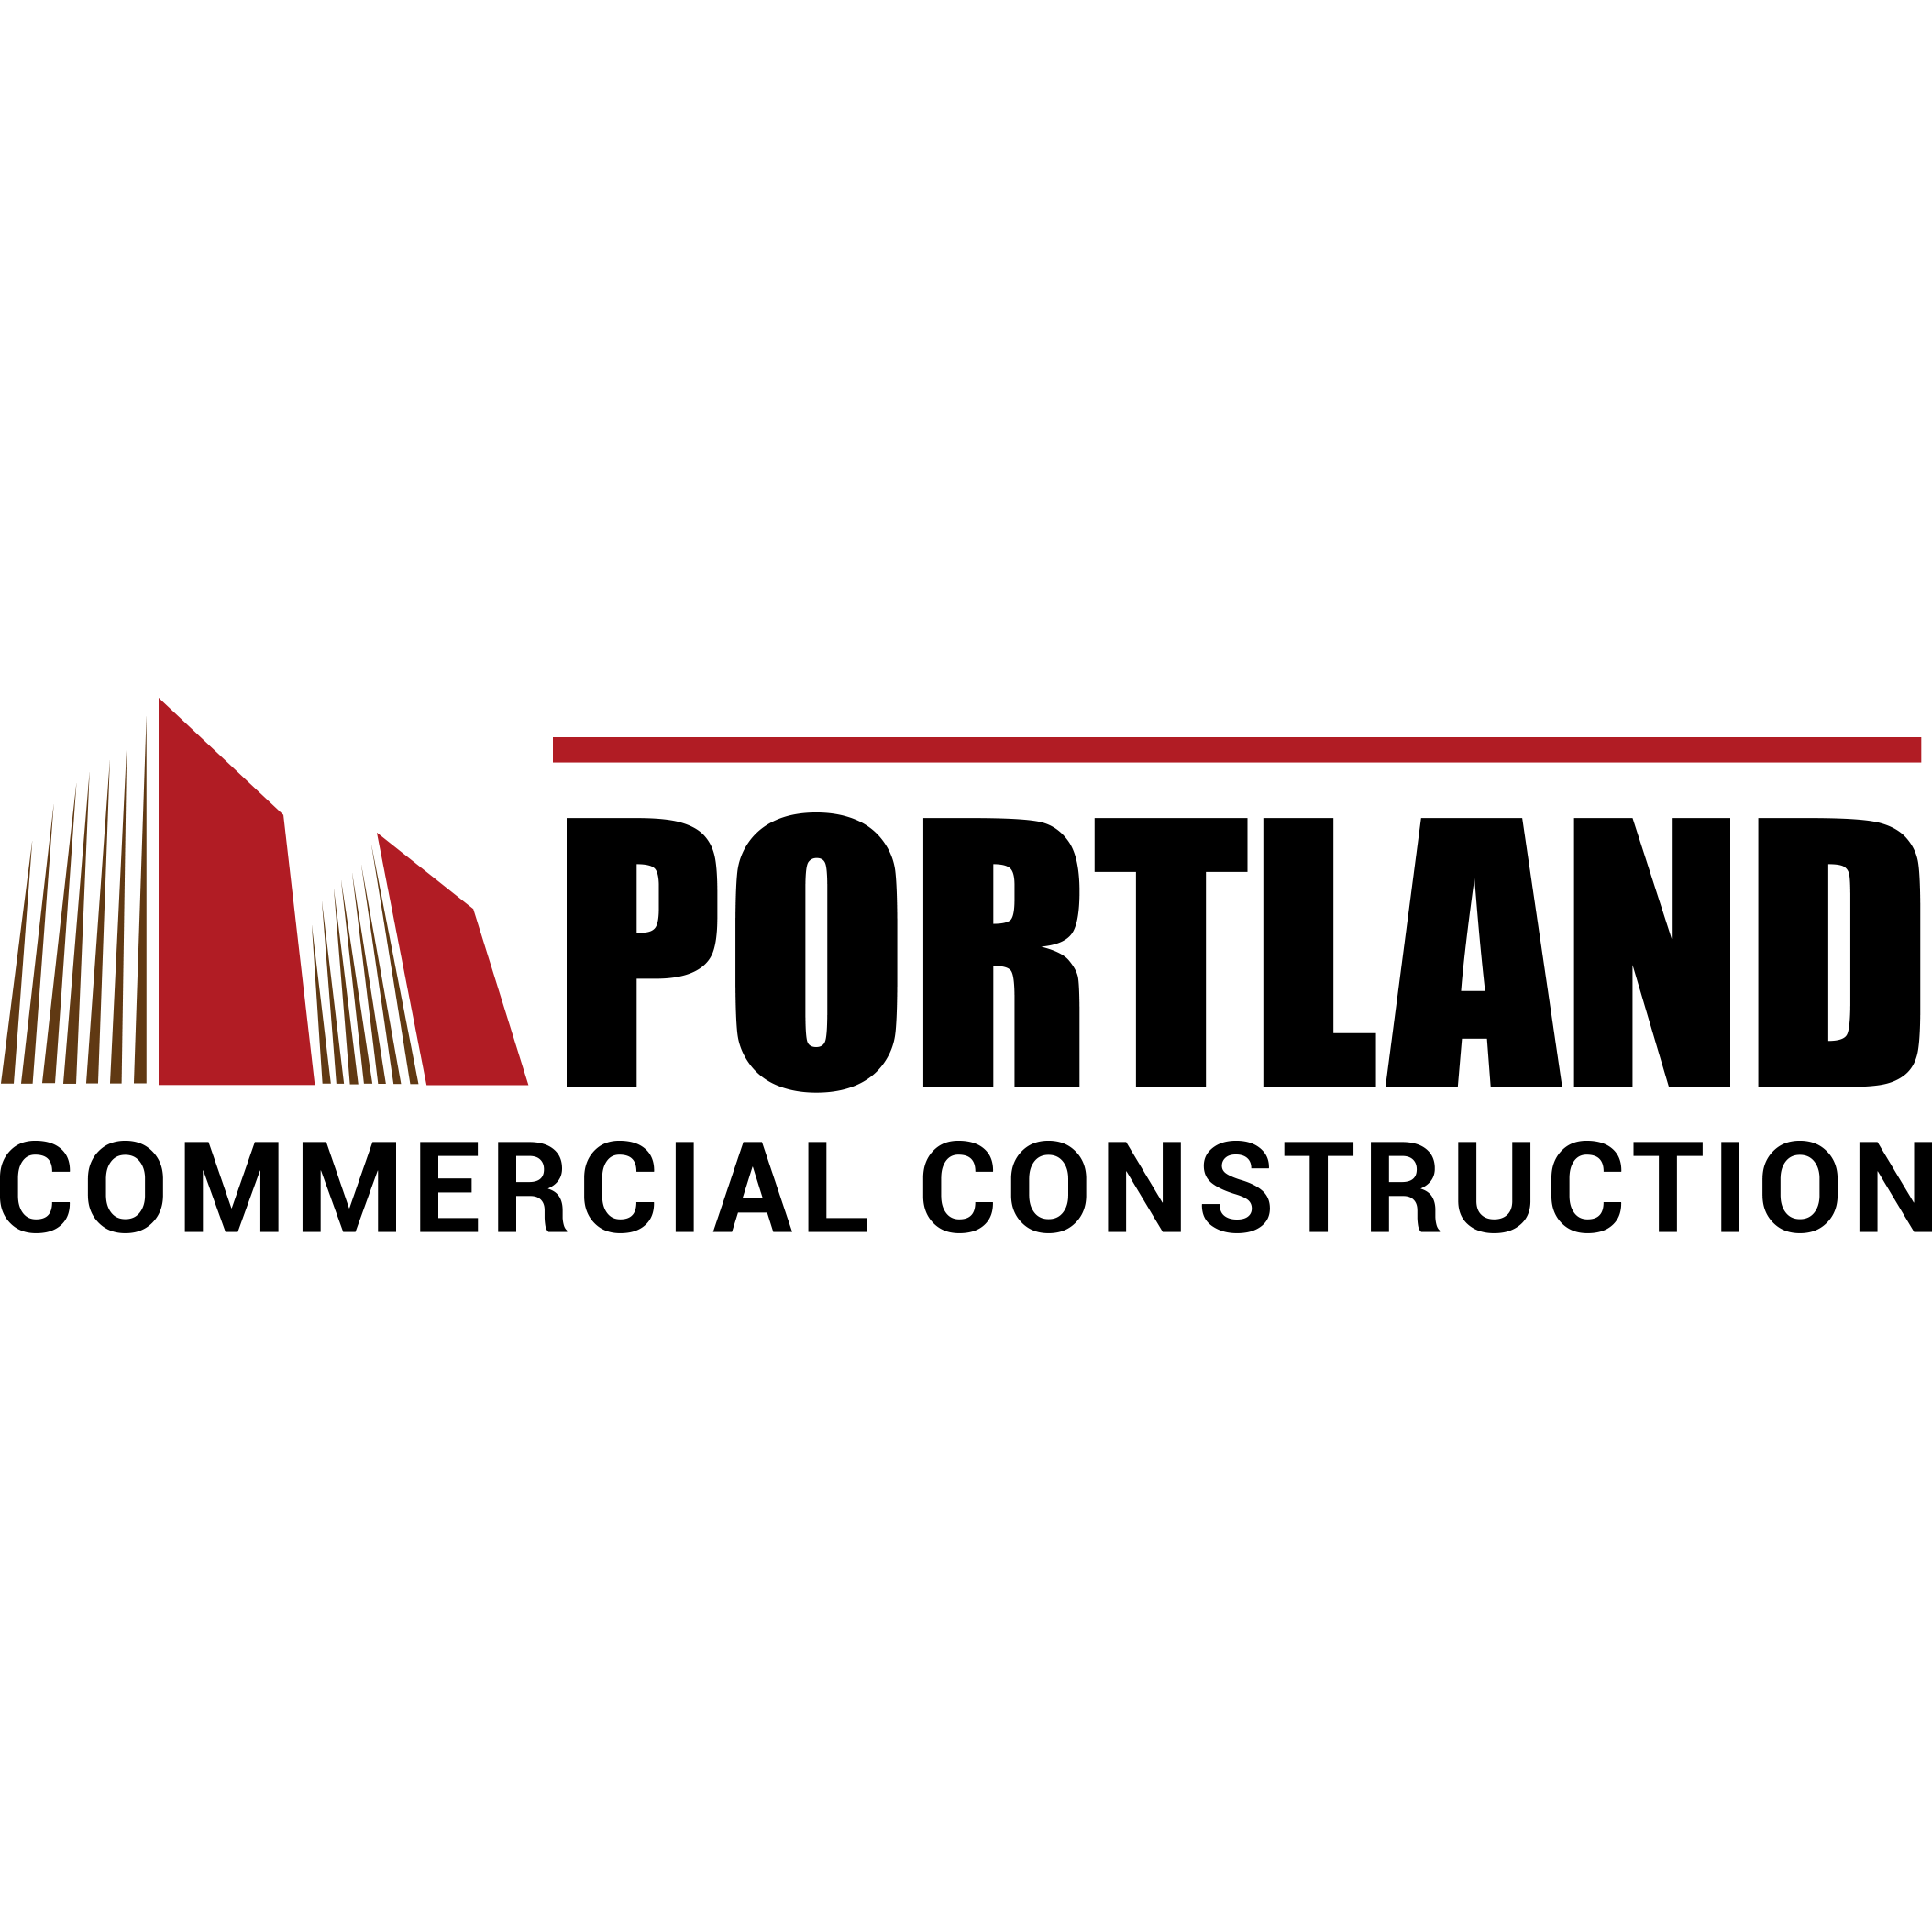 Portland Commercial Construction